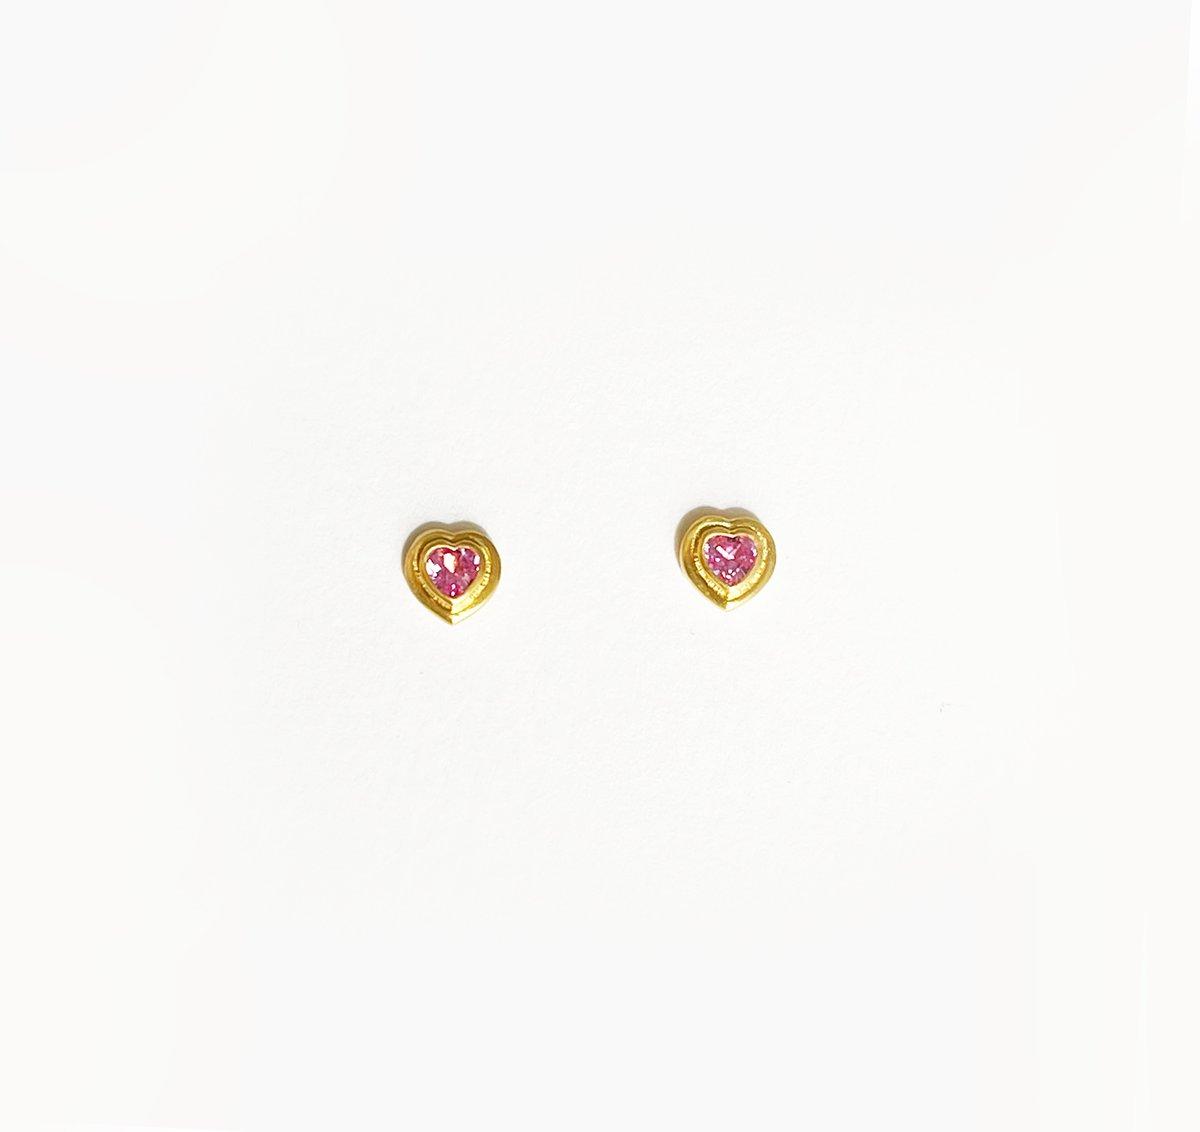 Image of Diana Heart Stud Earring